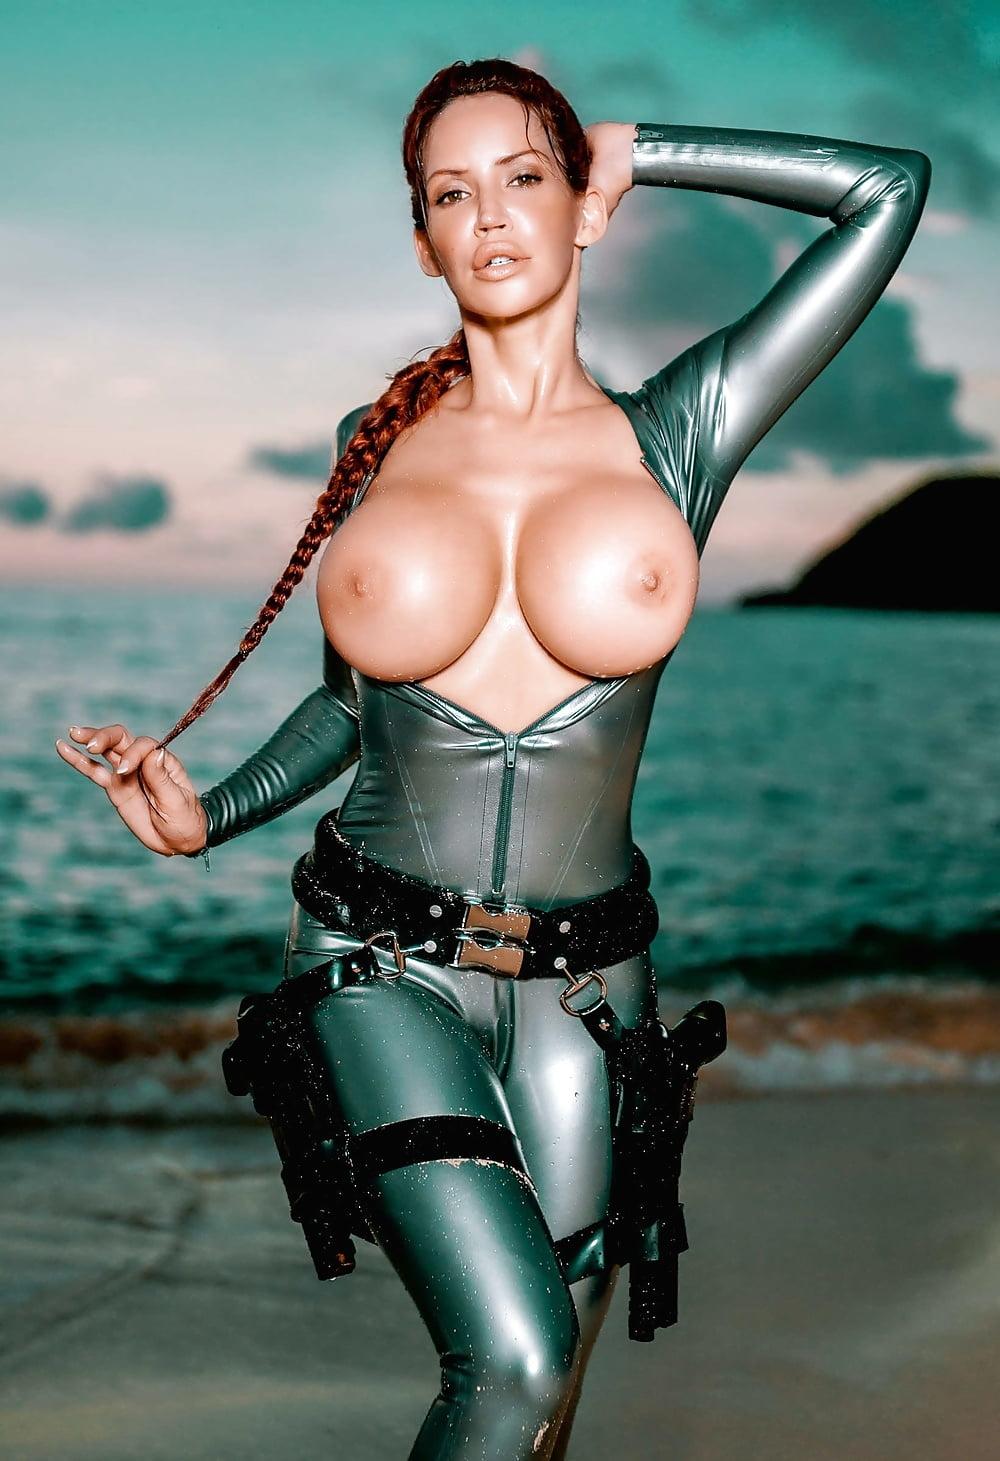 cosplay-big-tits-free-naked-girl-thumbs